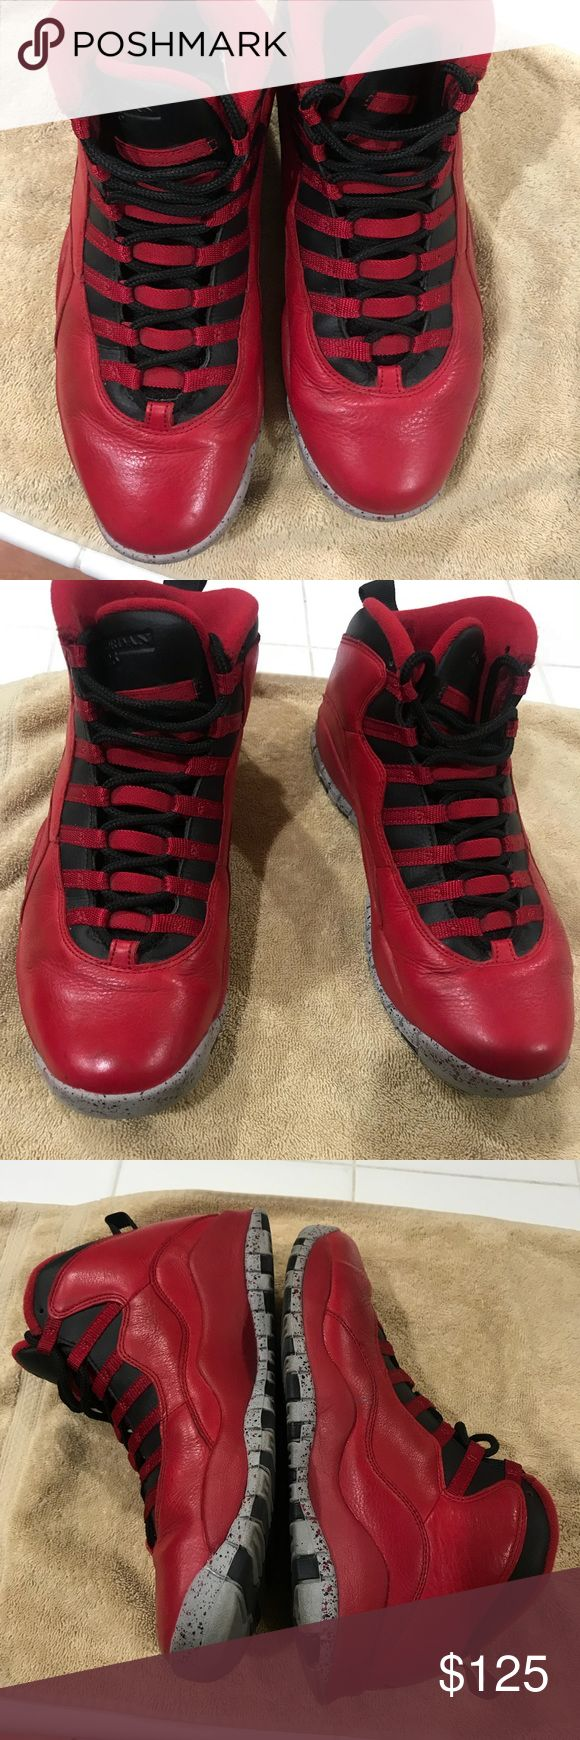 Bulls over Broadway Jordan's Men's. Size 10. Bulls Over Broadway.  Air Jordan 10 retro. Pre owned.  No box. Nike Shoes Athletic Shoes